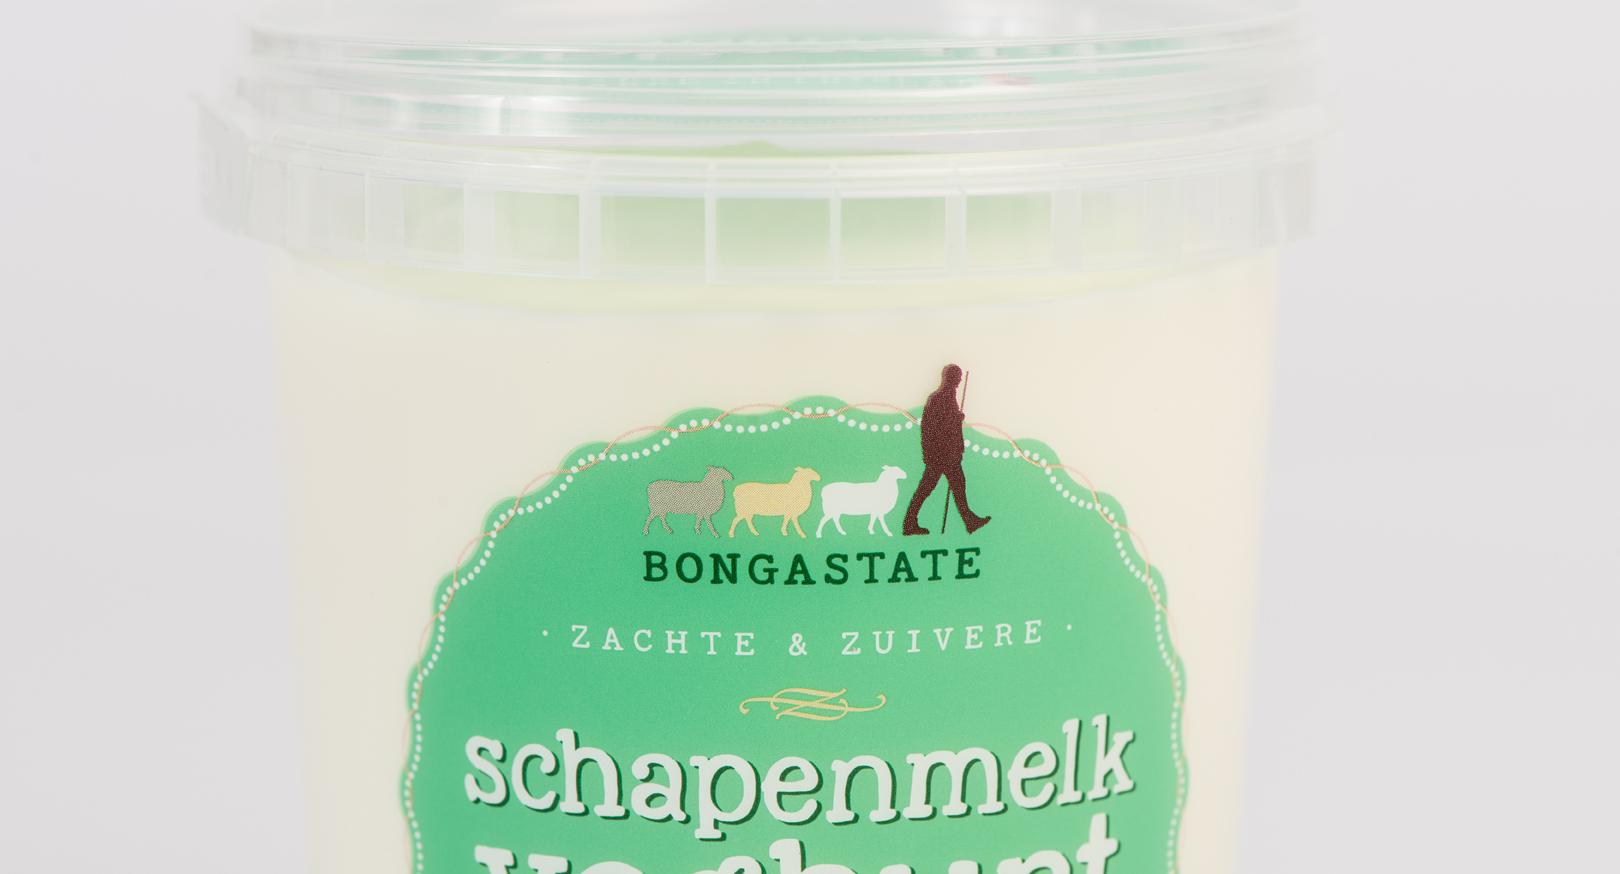 brand-story-logo-design-sheep-yoghurt-bongastate